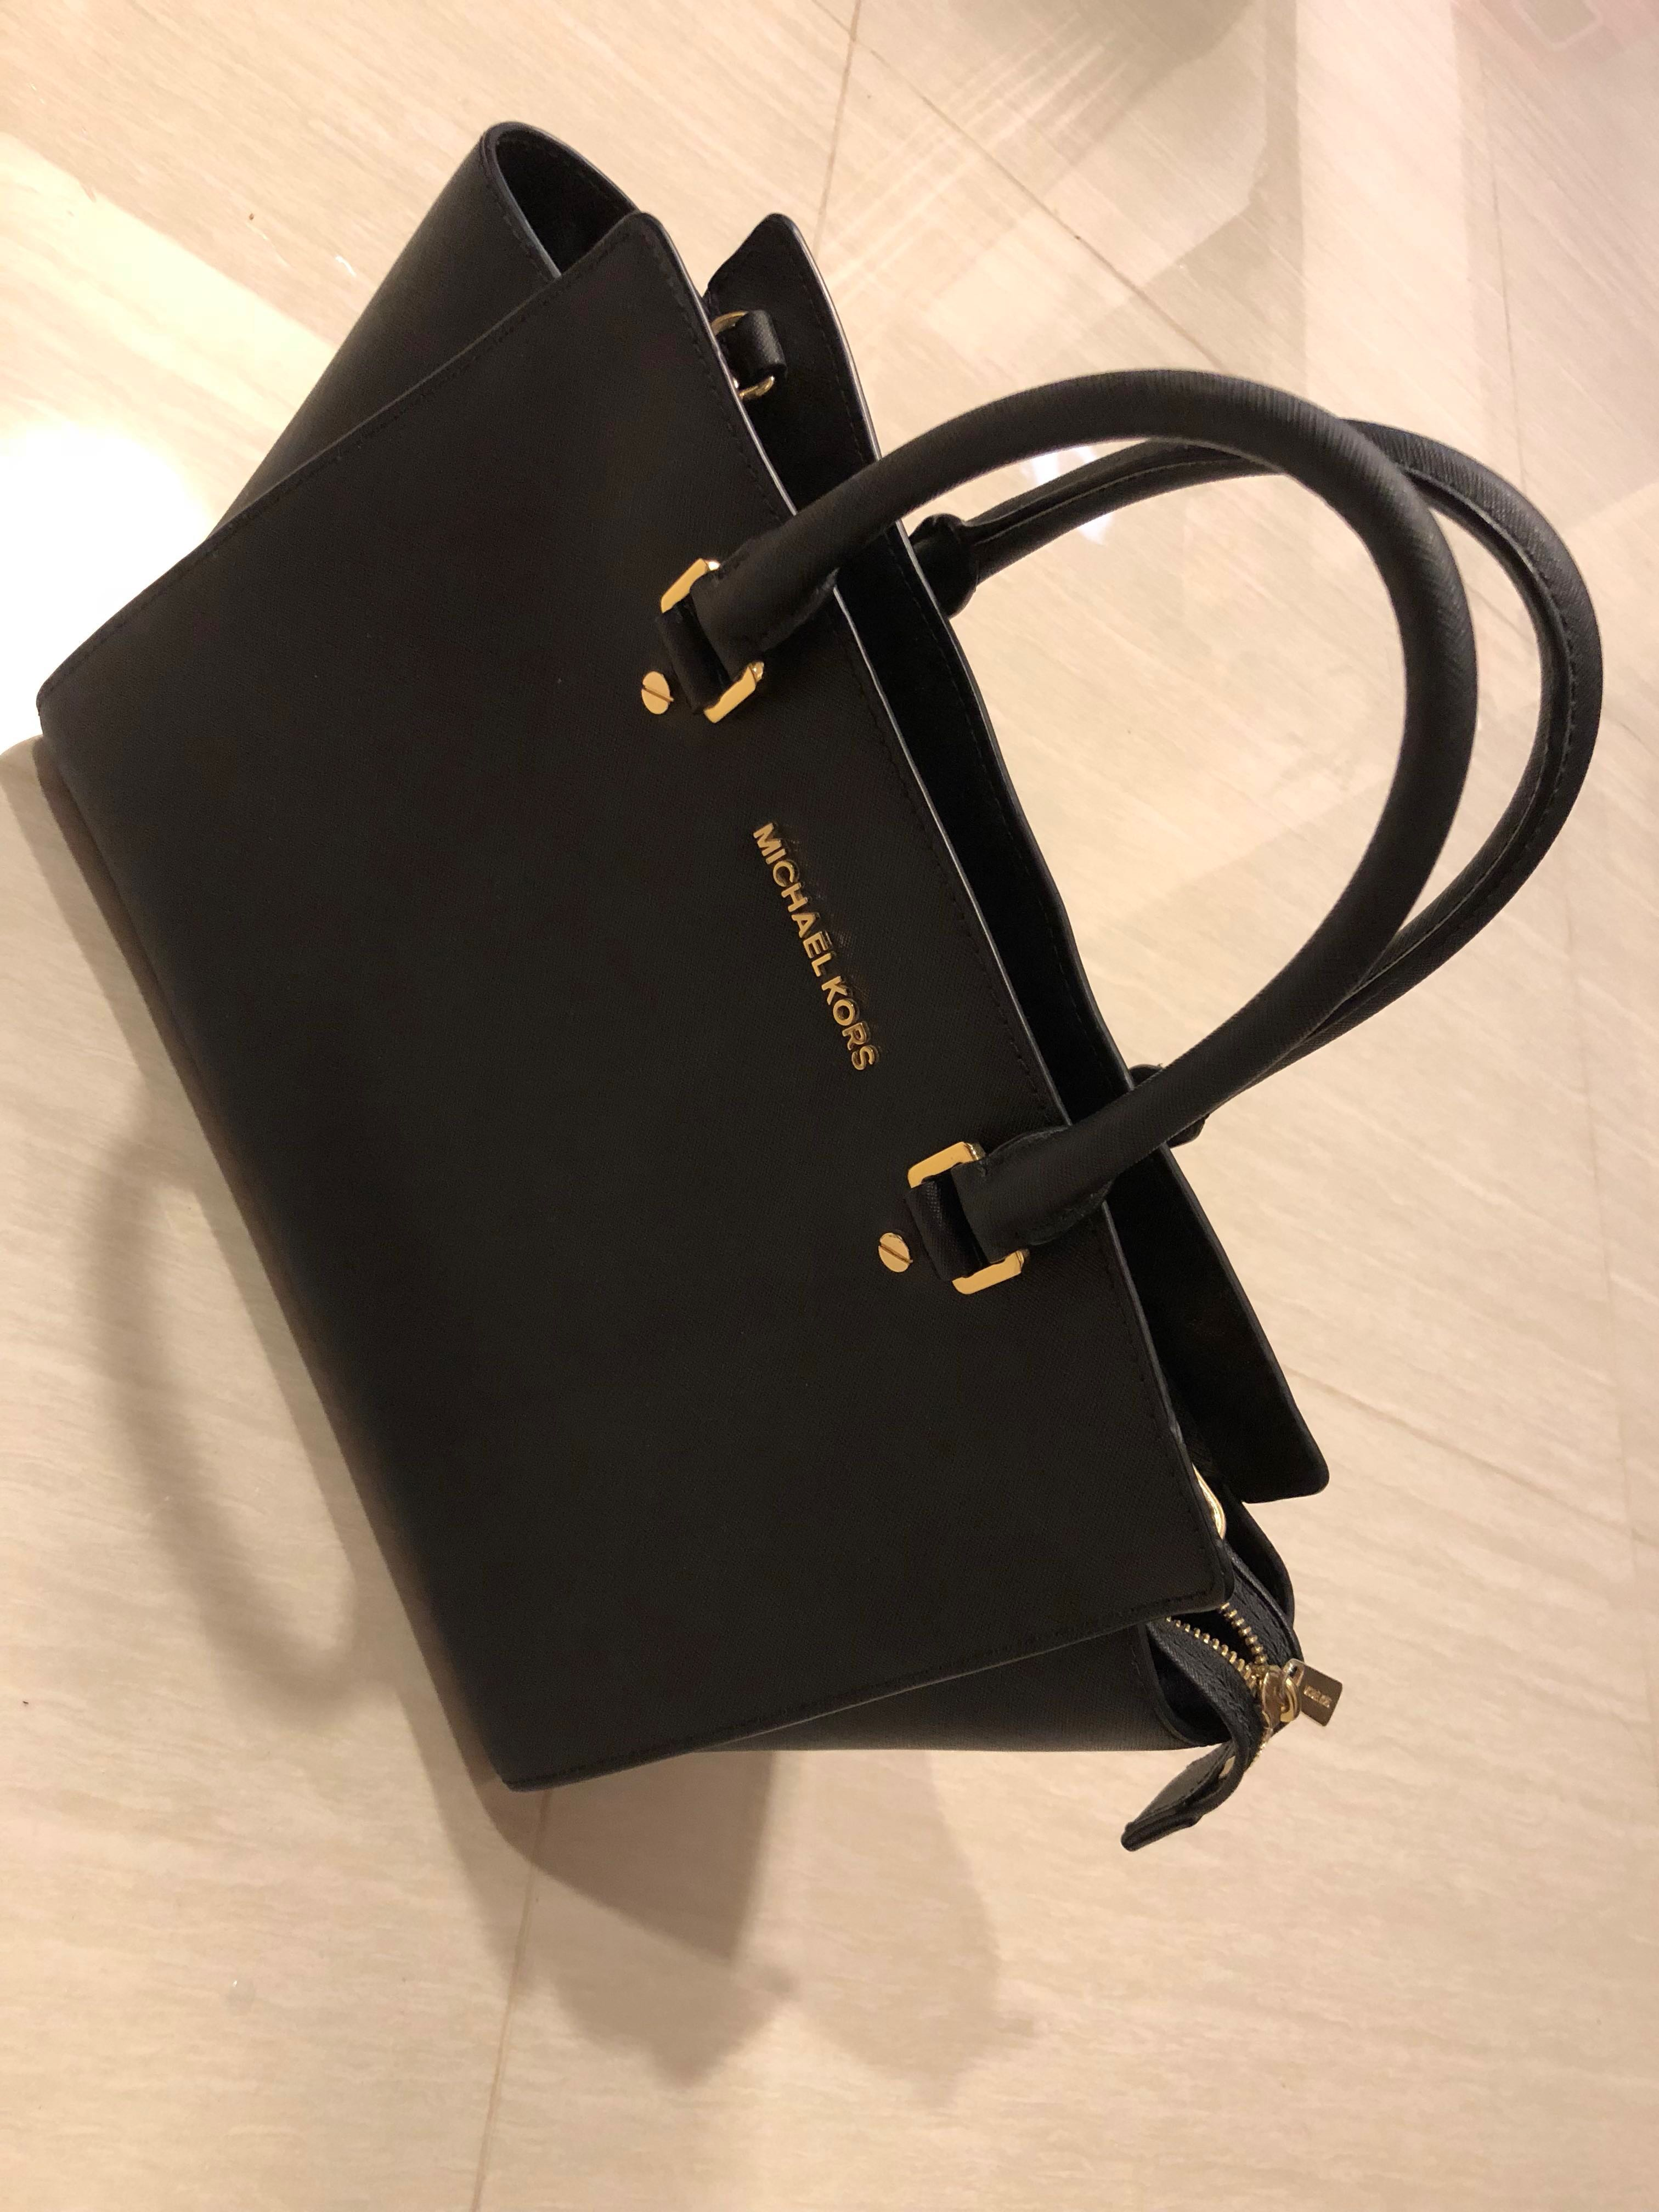 Classic Michael Kors Bag ( M size) free Michael kors bag cleaner ... e6797a6c3